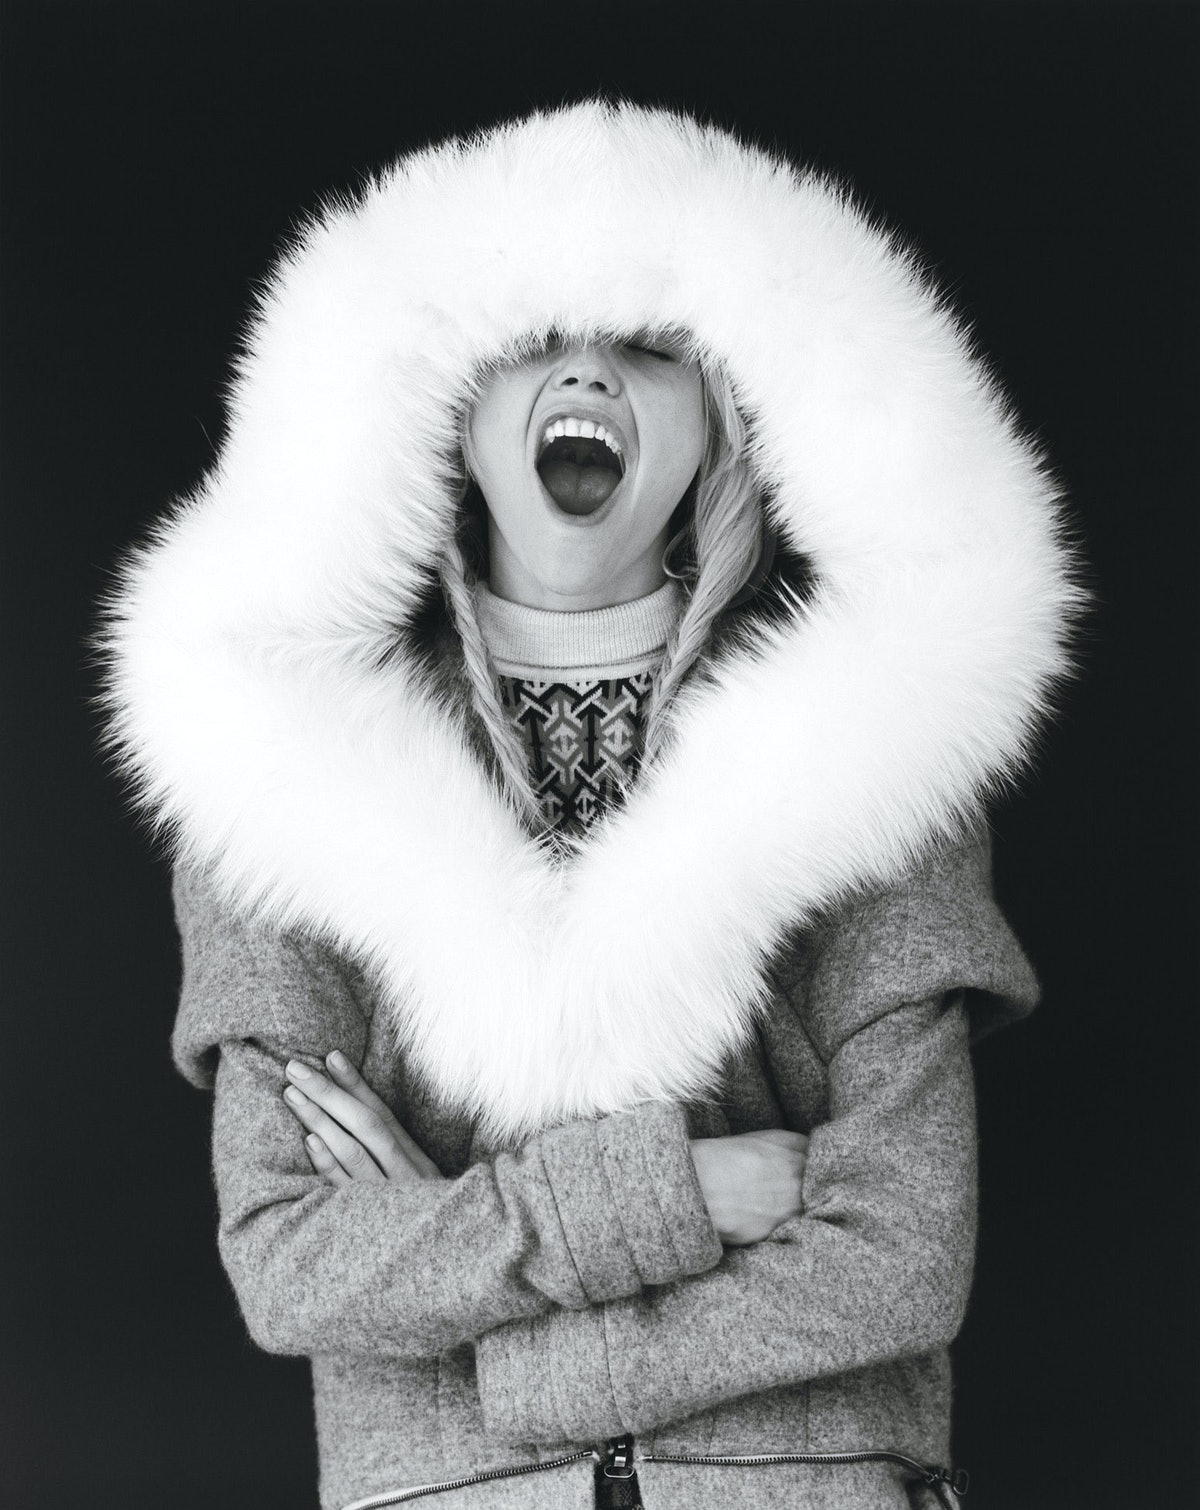 Photo by Bruce Weber, styled by Alex White; W Magazine July 2008